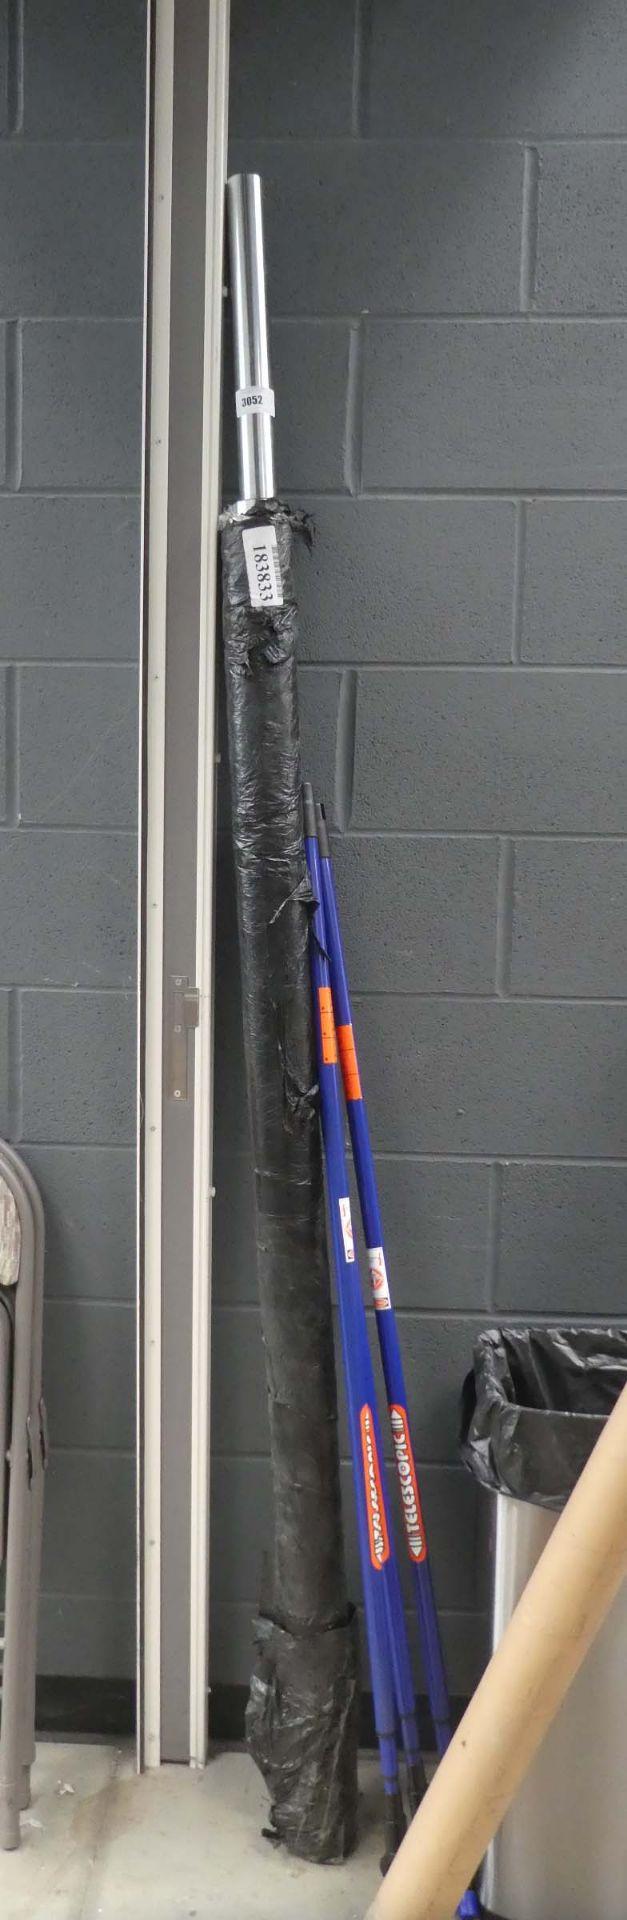 2 Olympic bench press bars